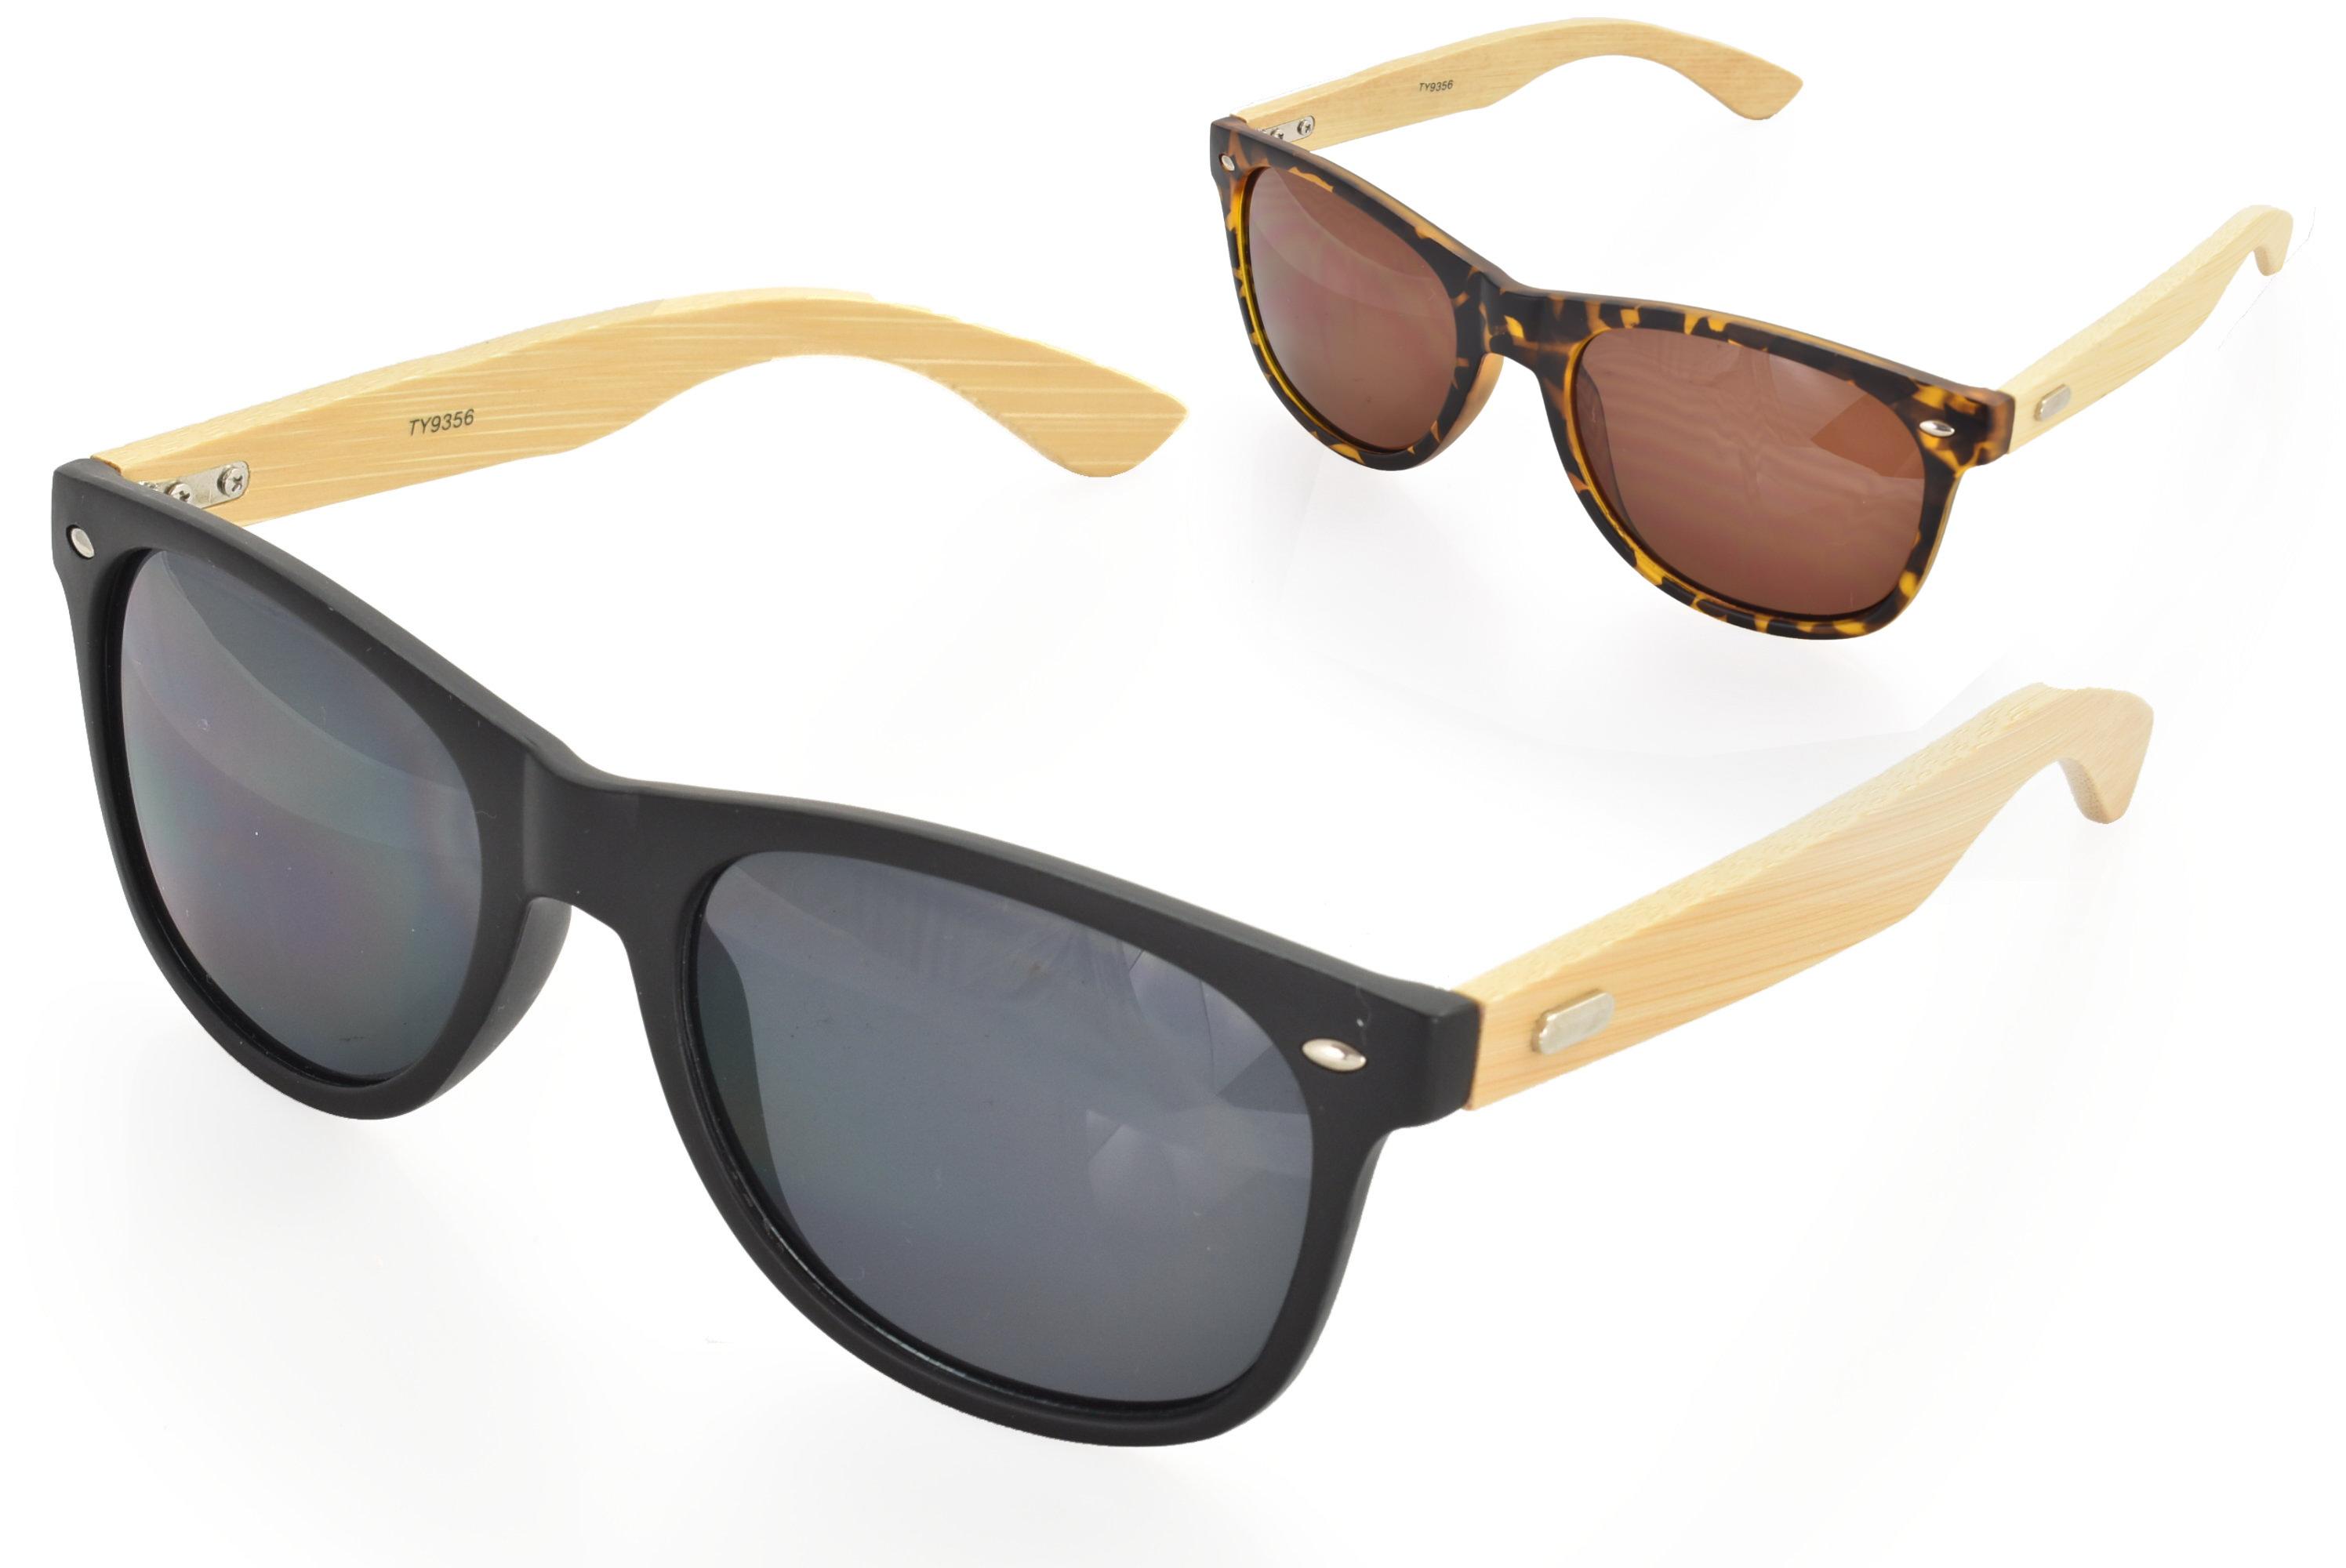 Adults Bamboo Arm Wayfarer Sunglasses - 2 Assorted